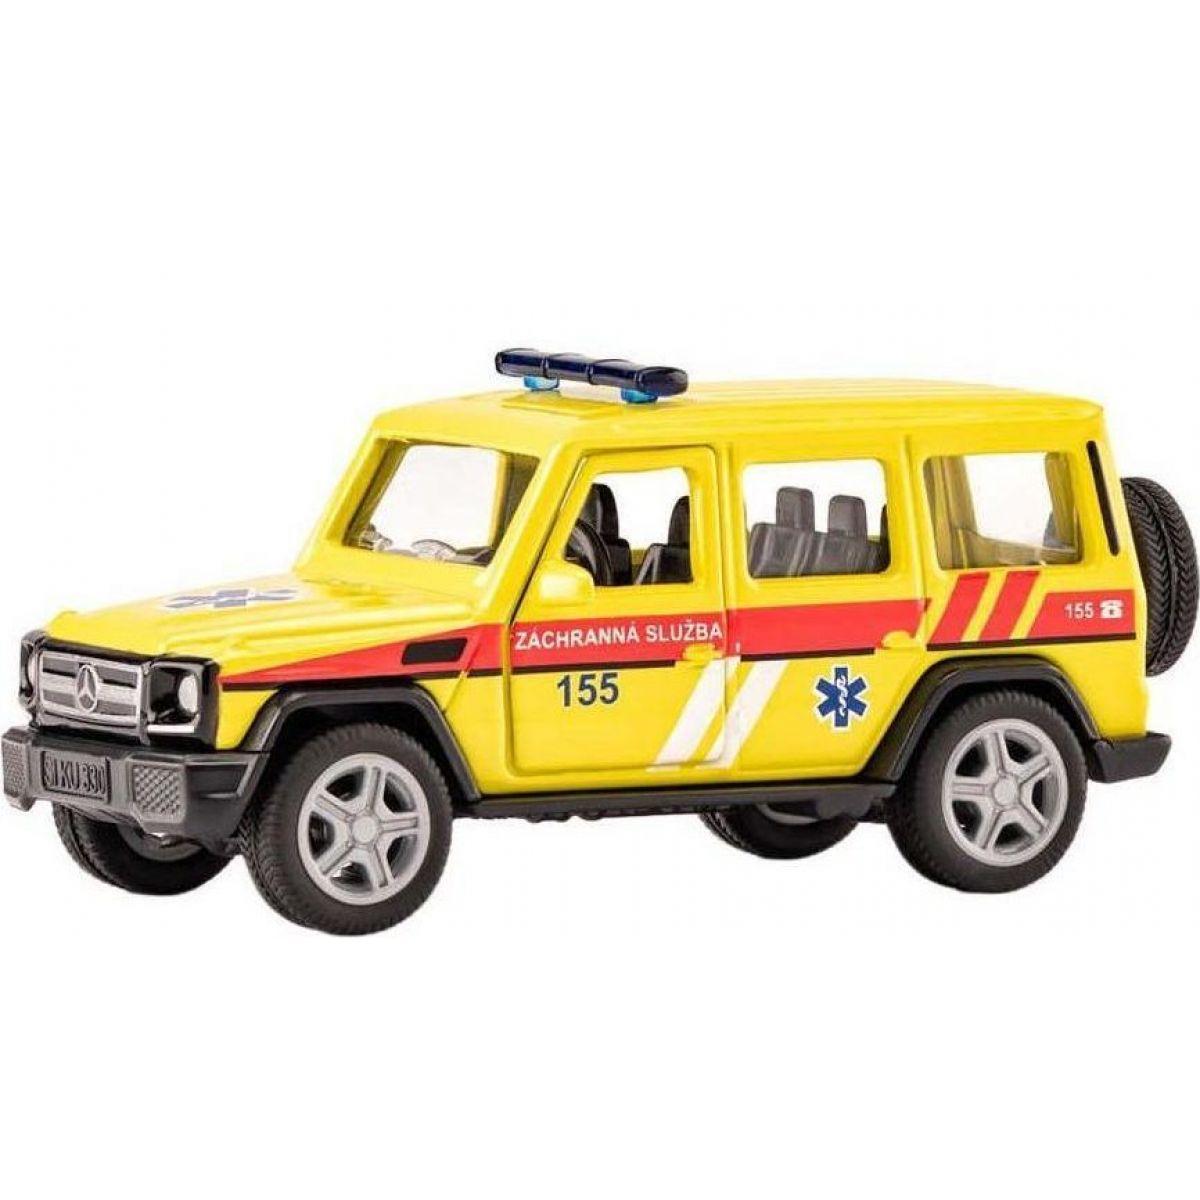 Siku super česká verzia ambulancia Mercedes AMG G65